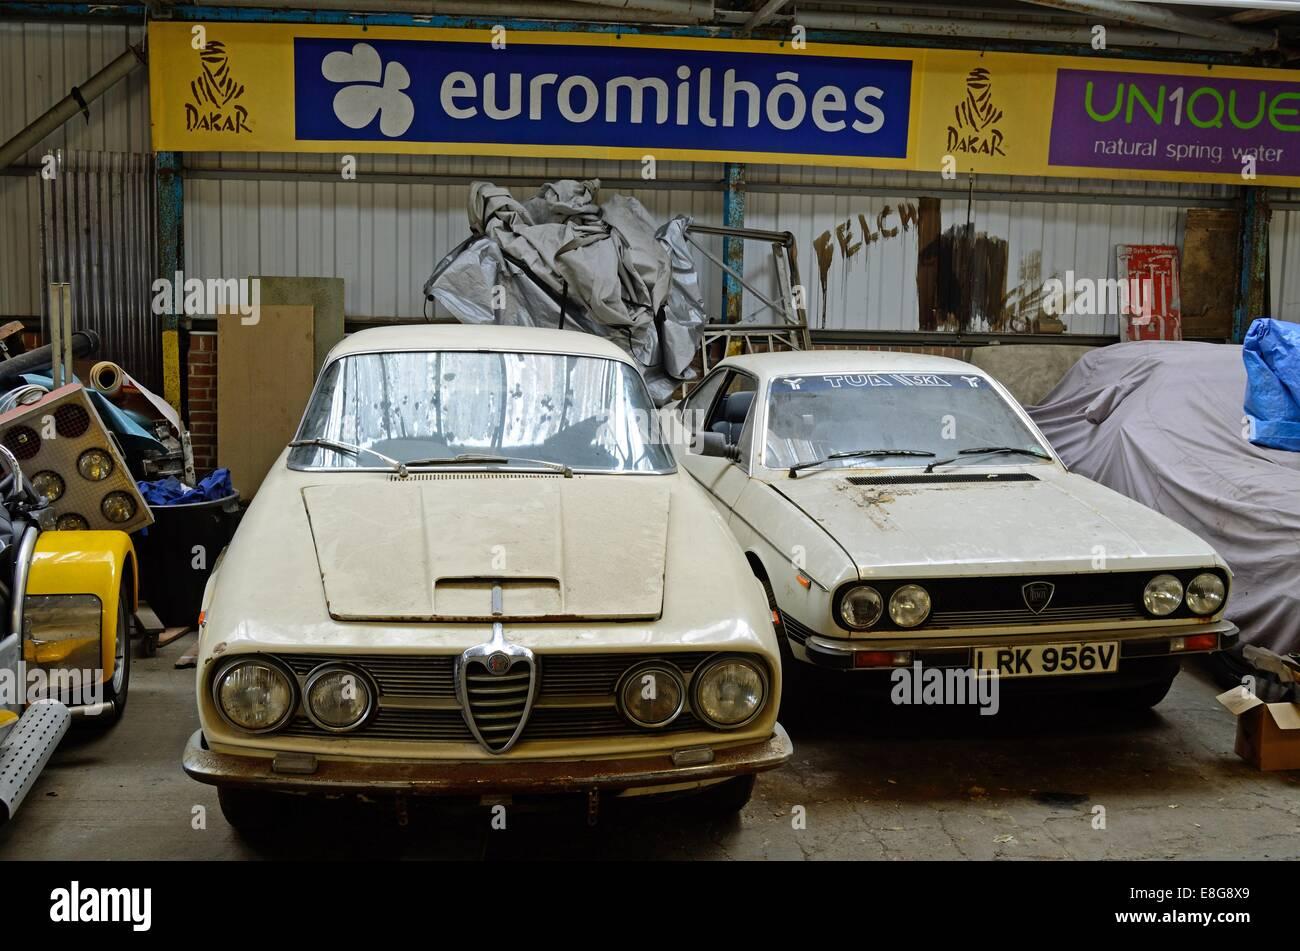 dune-alfa-romeo-et-lancia-beta-debout-dans-un-atelier-garage-en-desordre-e8g8x9.jpg